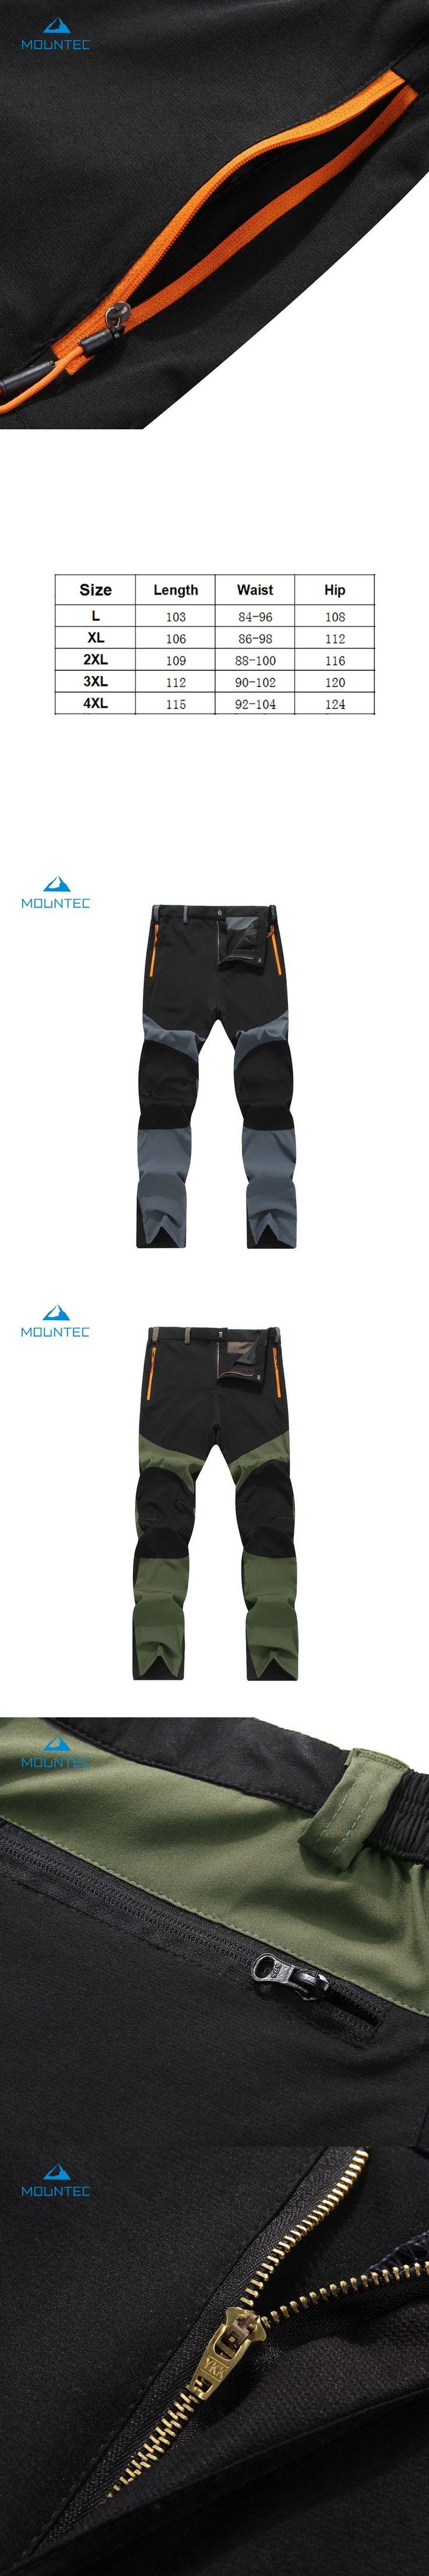 MOUNTEC Man Spring Autumn Fishing Waterproof Camping Trekking Wearable Outdoor Hiking Pants Climbing Softshell Trouser Travel